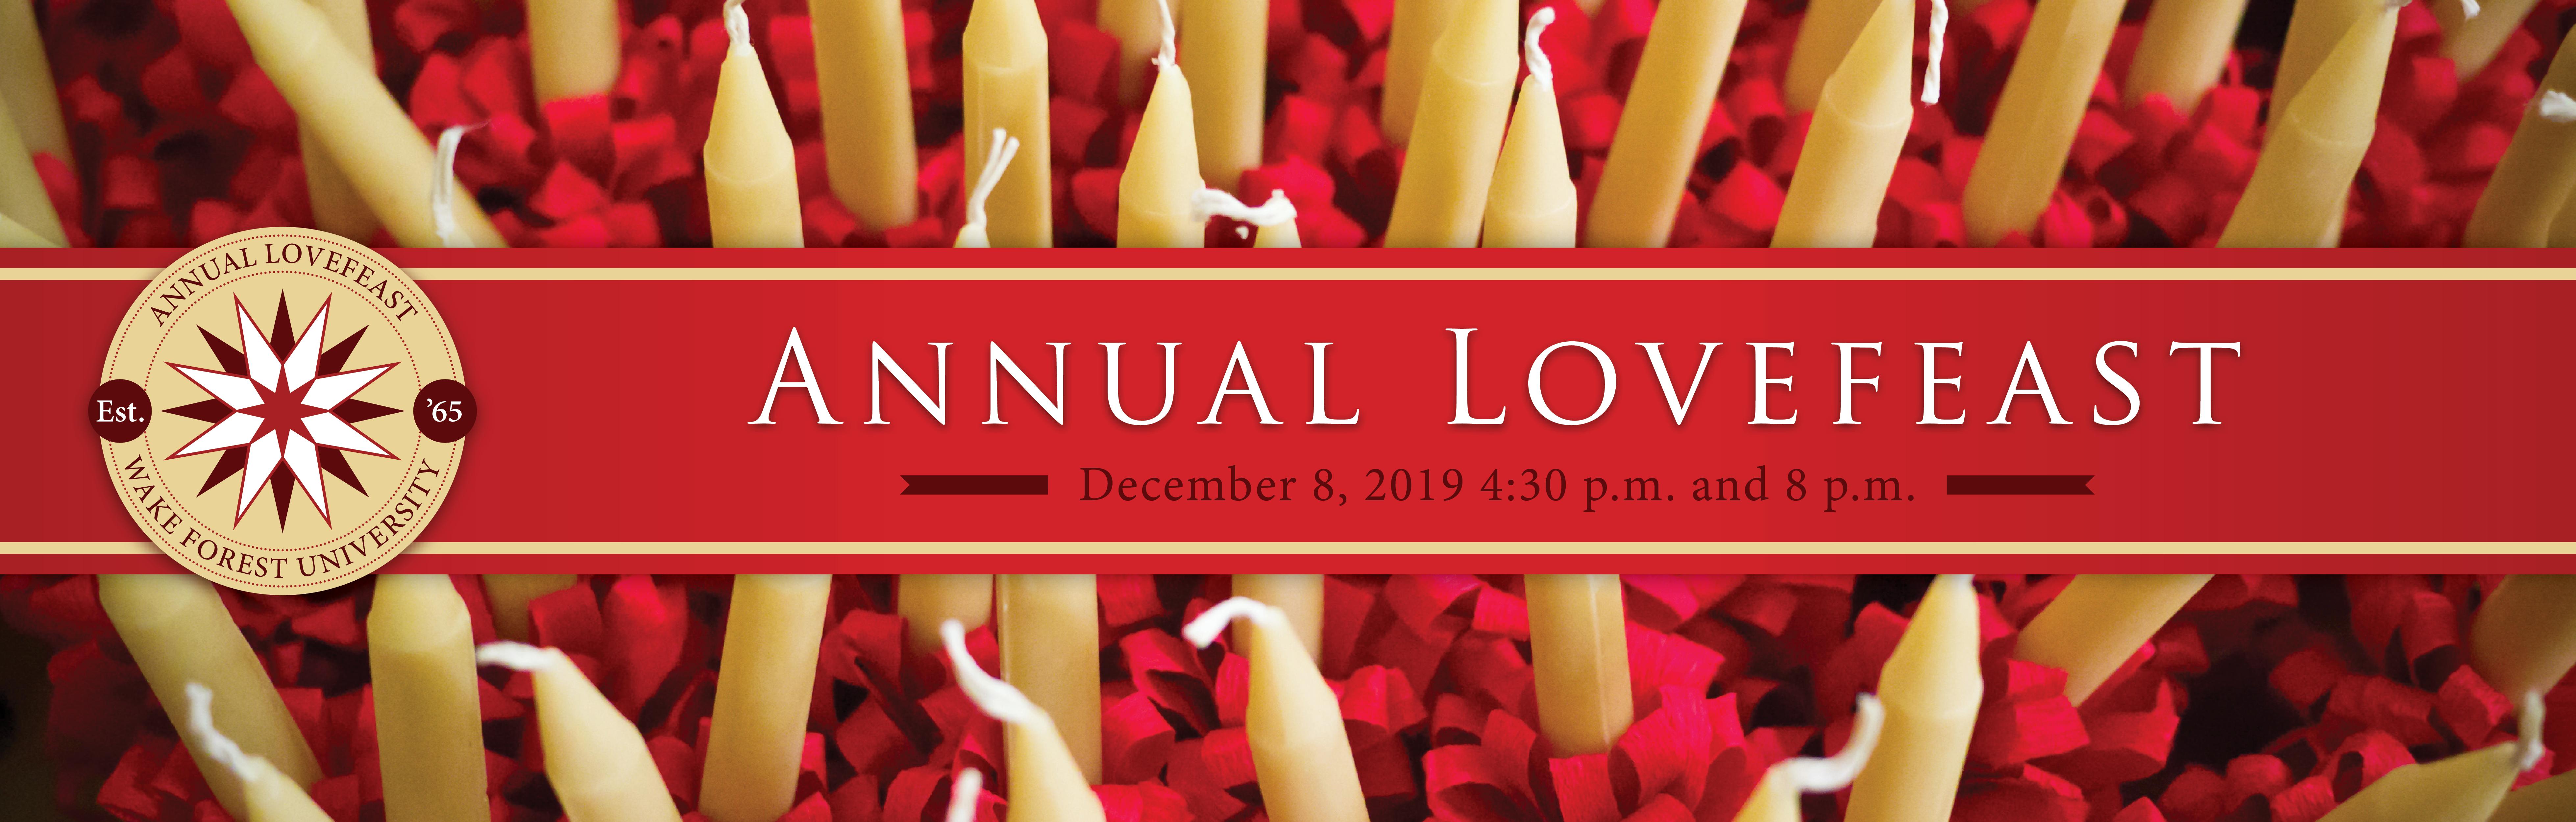 Lovefeast 2019 Web Banner1